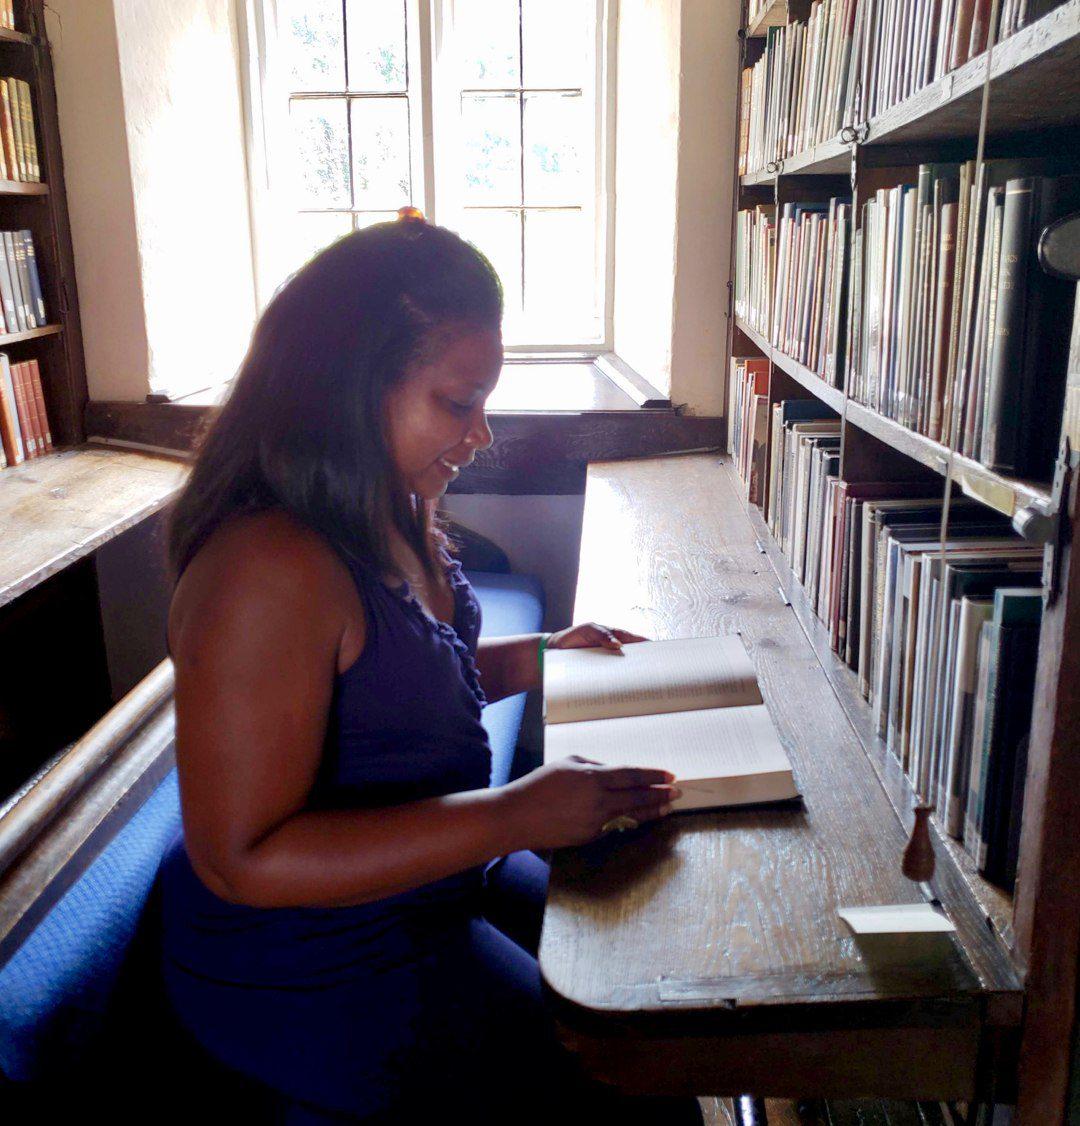 Keisha Rembert at a Gilder Lehrman institute focusing on Abraham Lincoln at Oxford University.